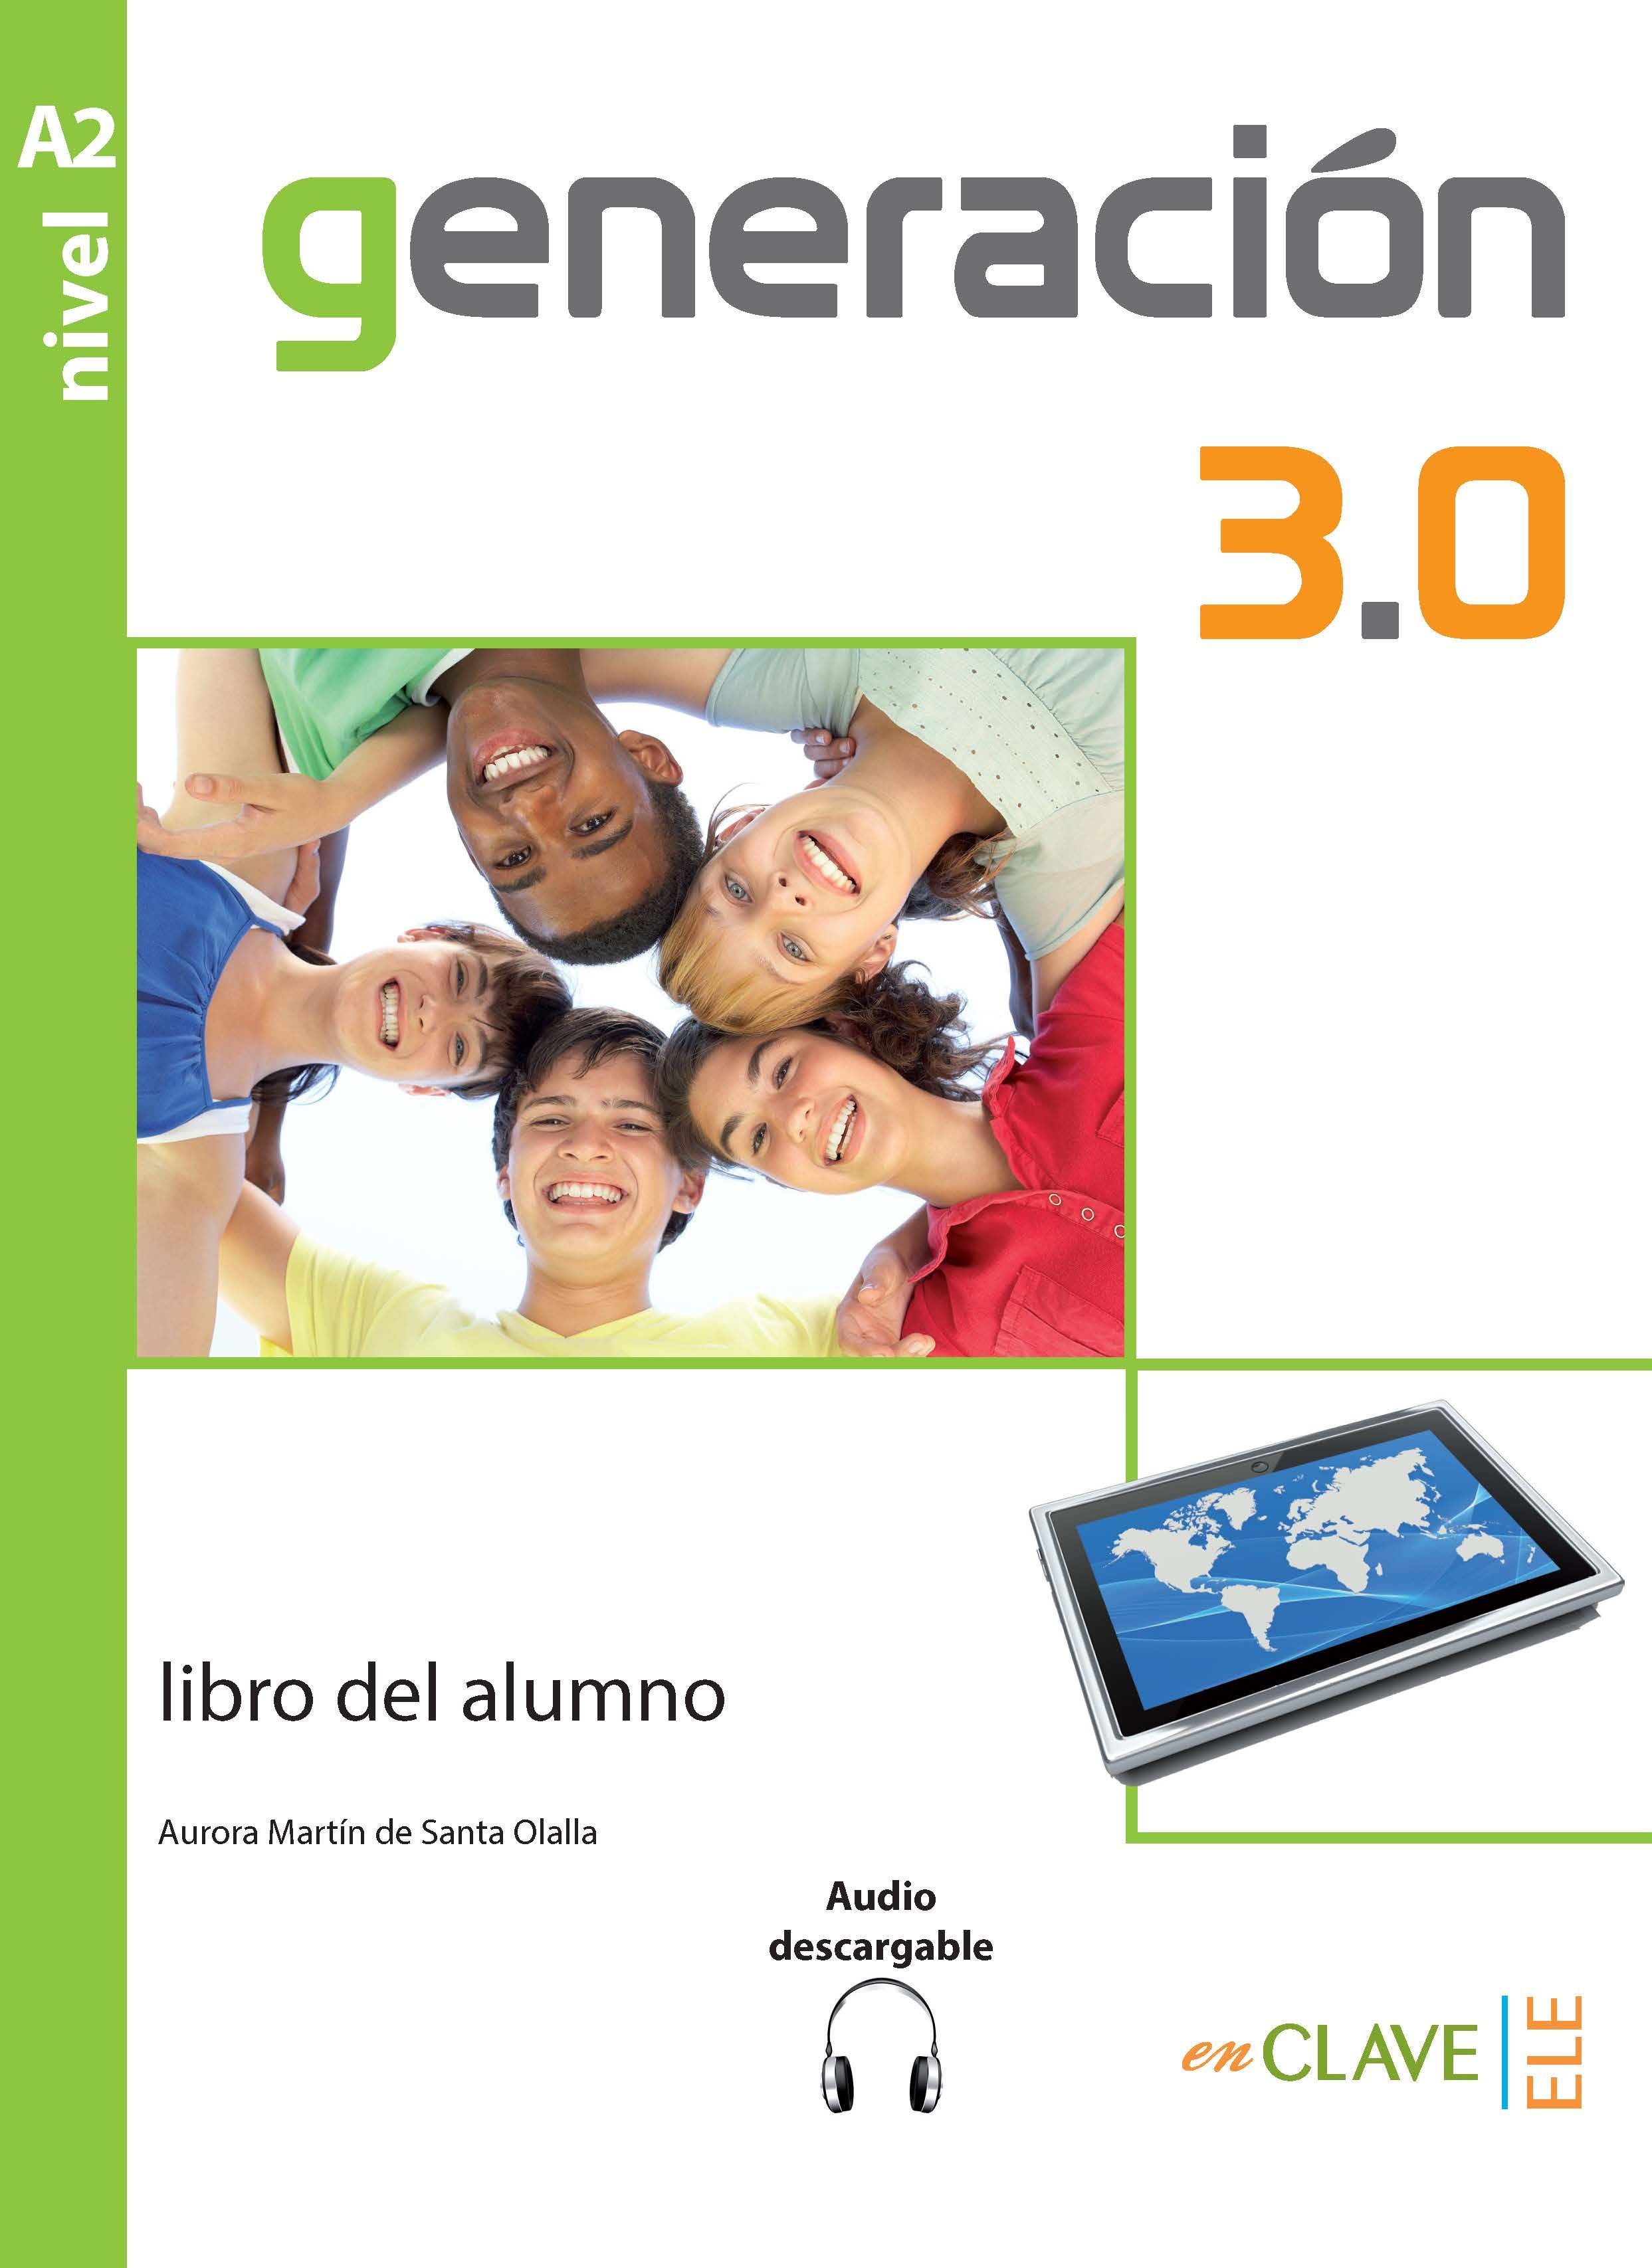 Ideas novedosas e interesantes para la enseñanza del español a adolescentes